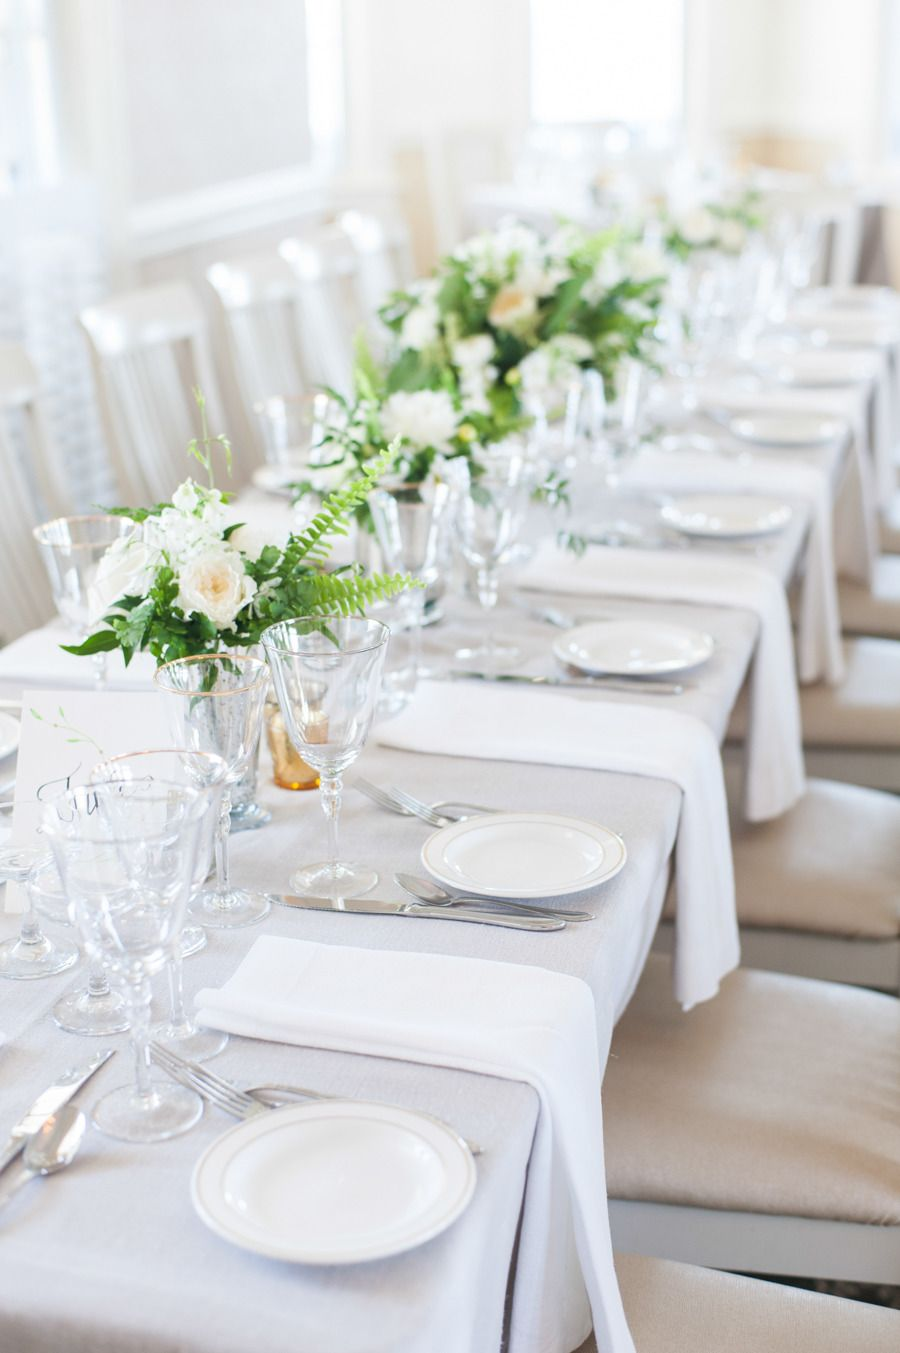 Block Island Wedding at the Spring House Hotel Wedding